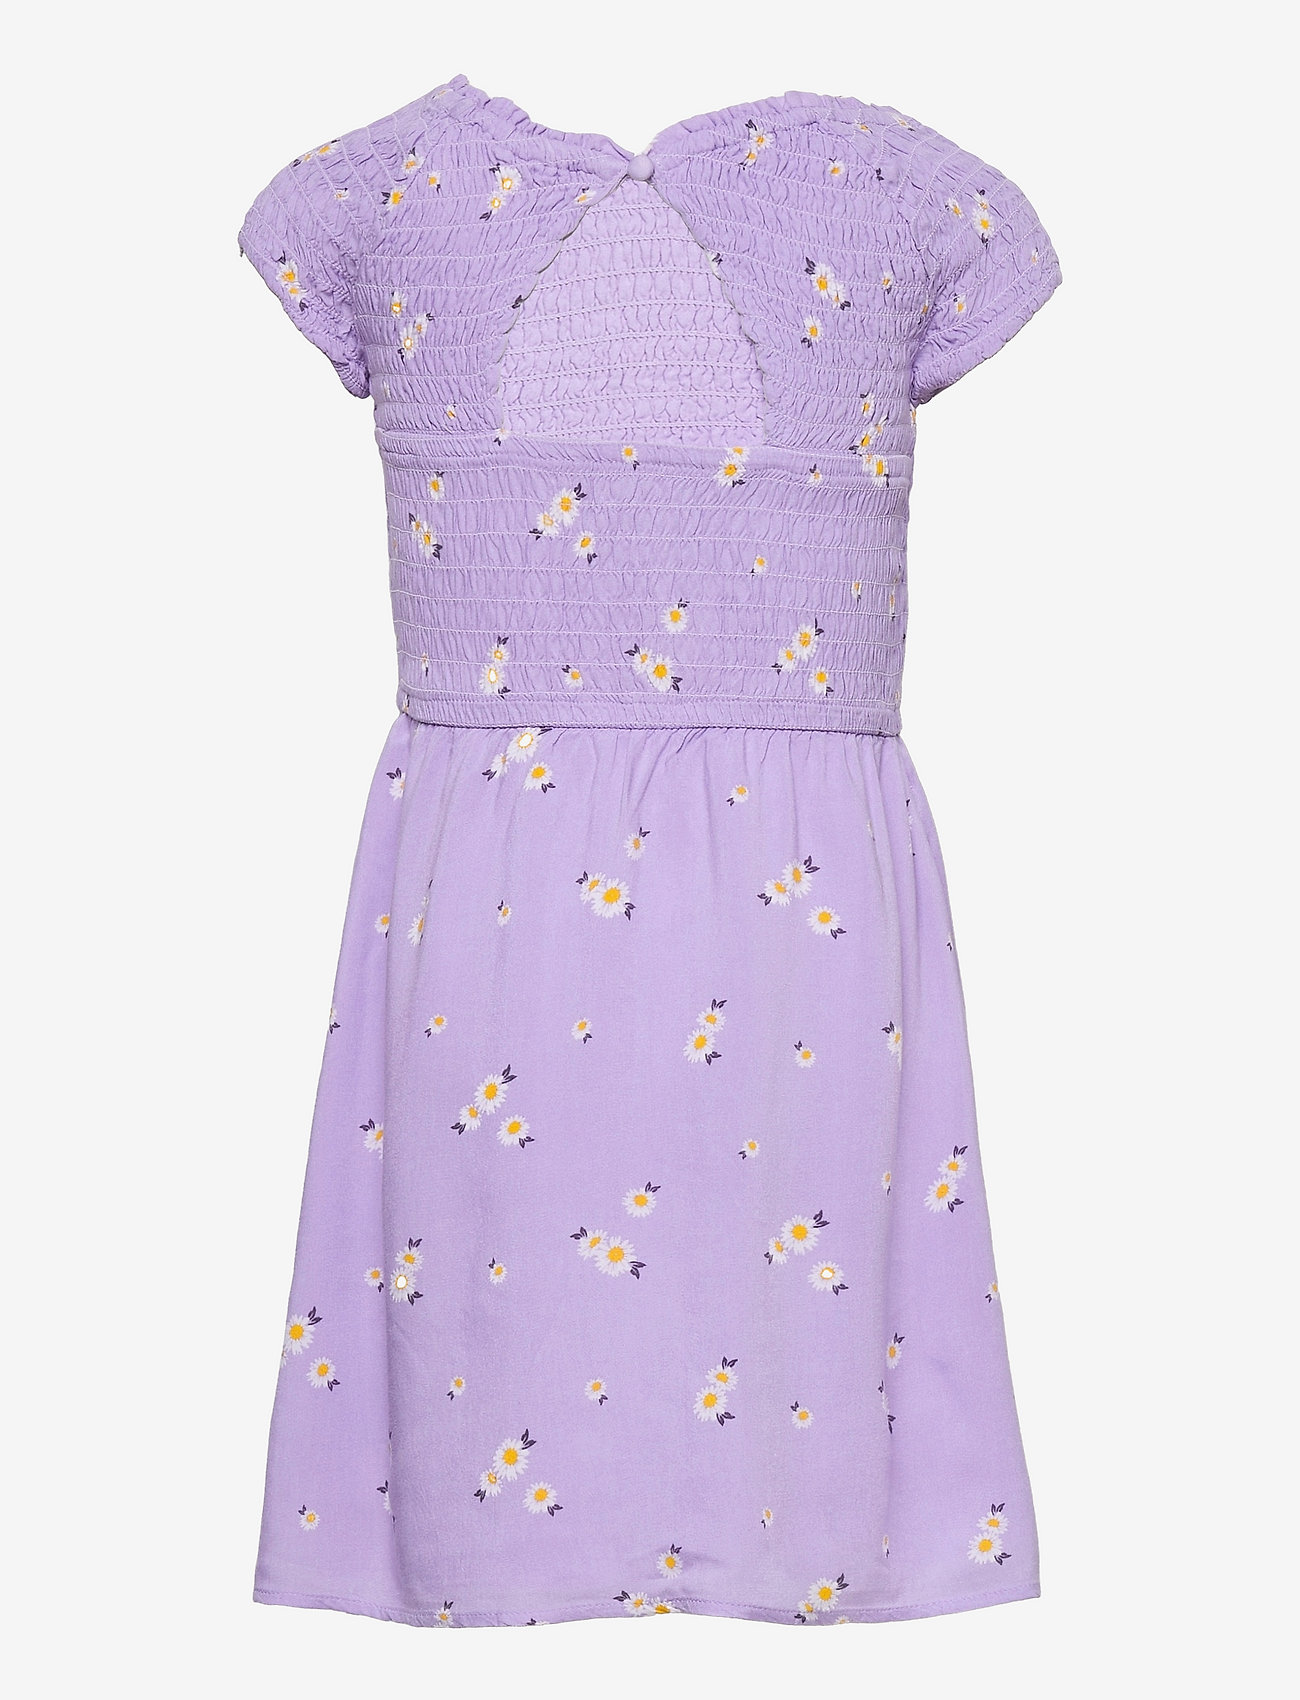 Abercrombie & Fitch - kids GIRLS DRESSES - kleider - light pink patter - 1